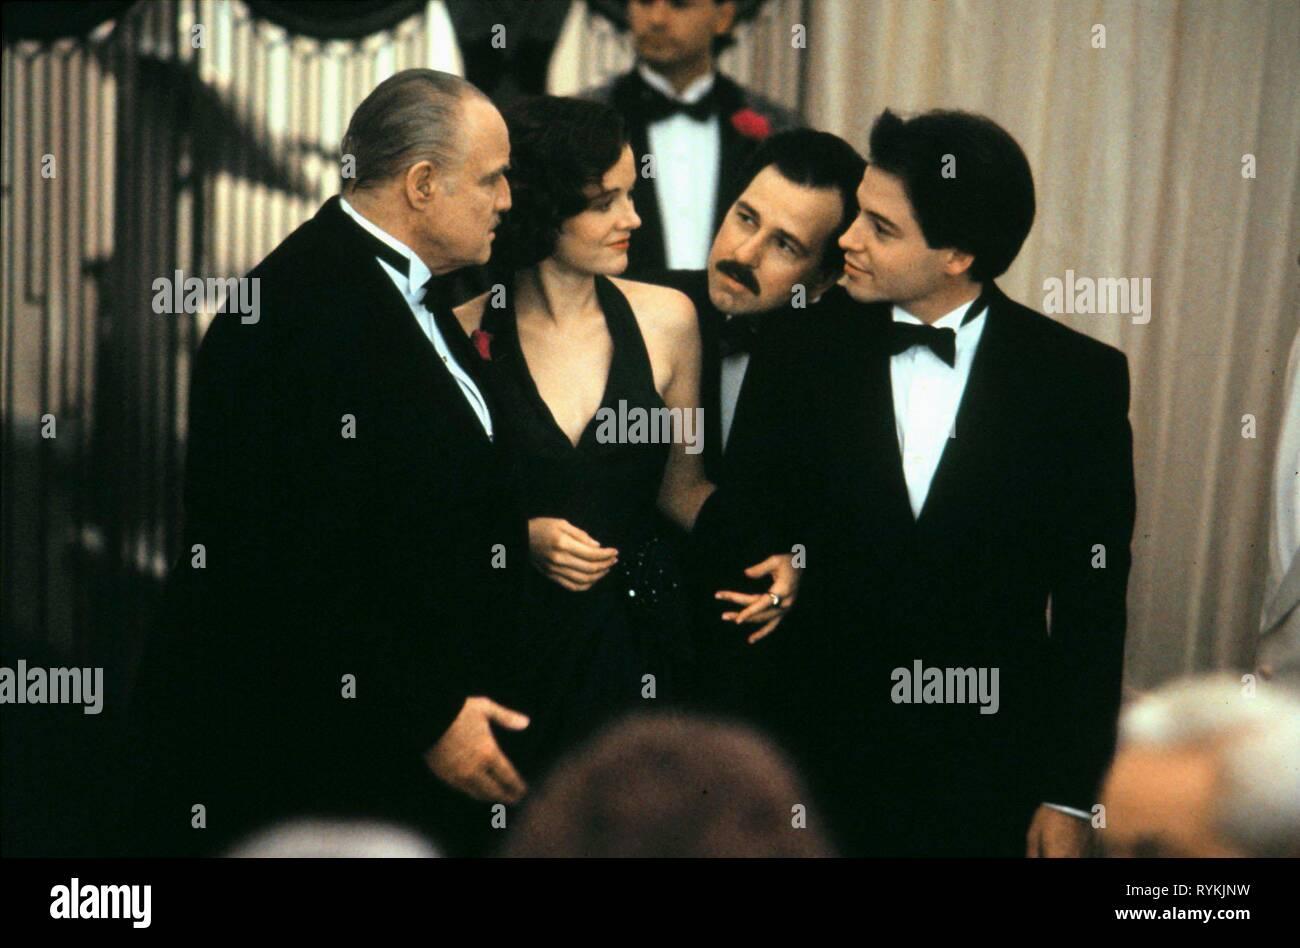 BRANDO,MILLER,KIRBY,BRODERICK, THE FRESHMAN, 1990 - Stock Image